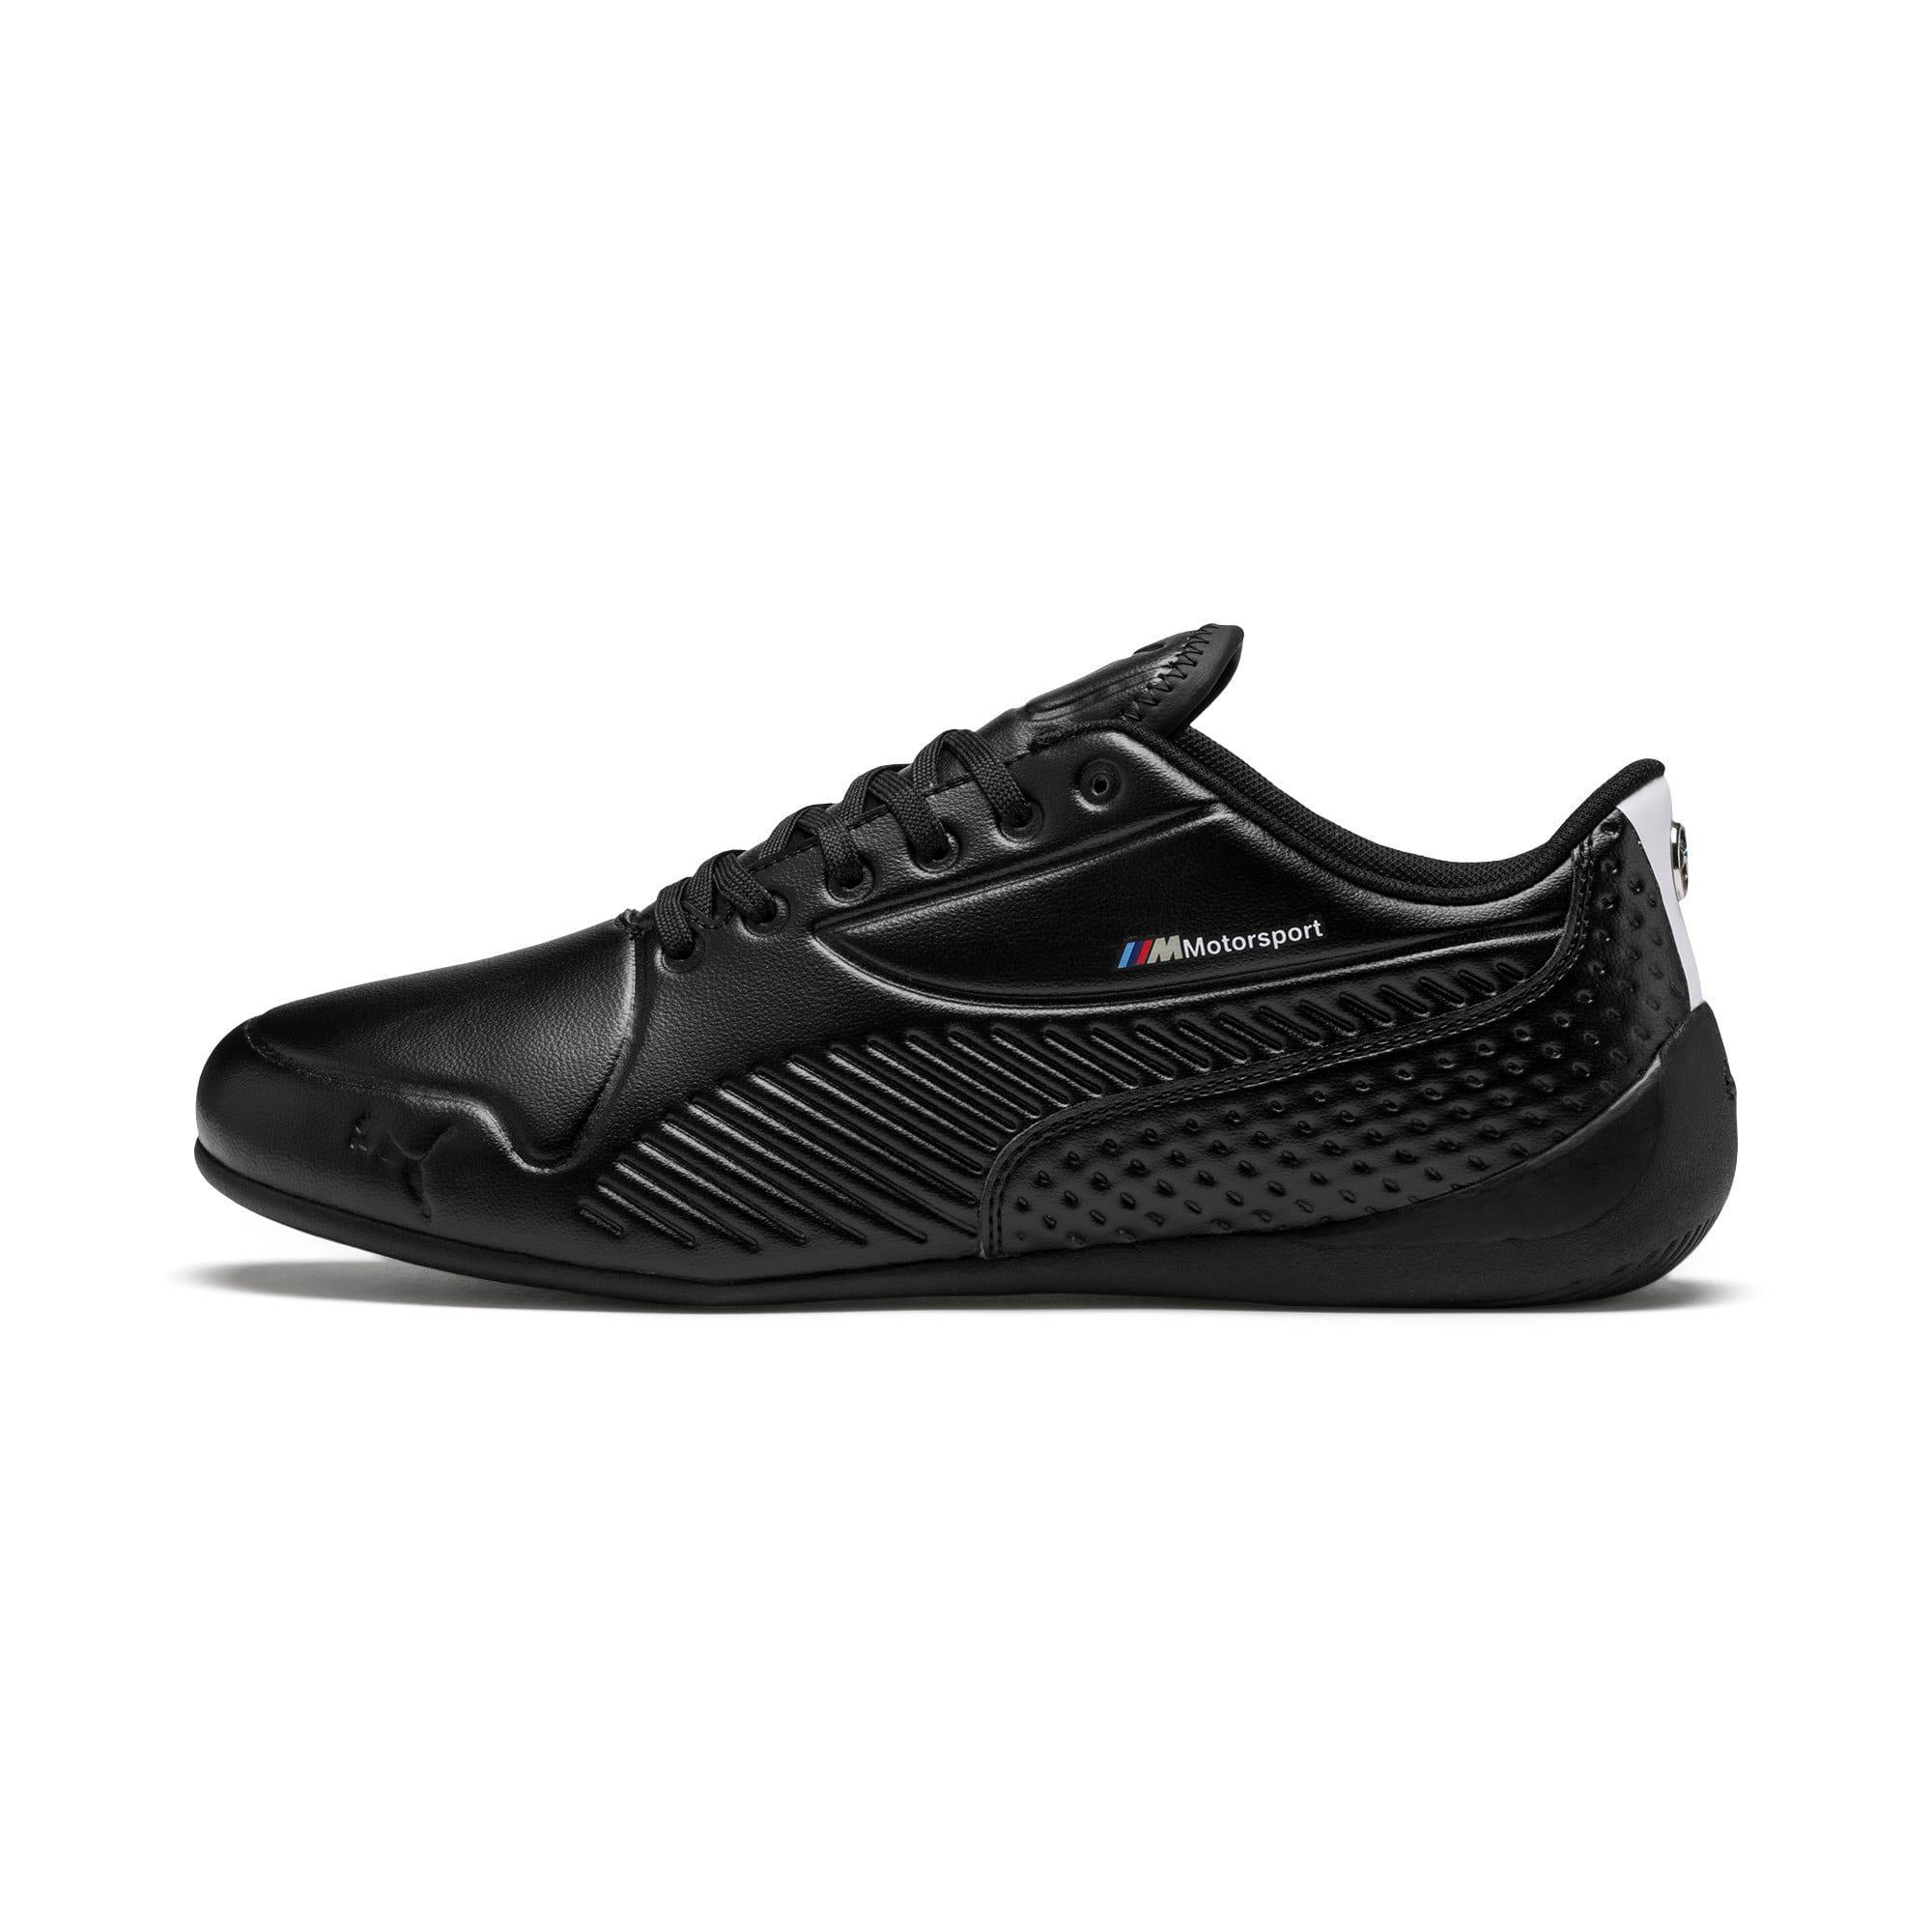 Miniatura 1 de Zapatos BMW M Motorsport Drift Cat 7S Ultra, Puma Black-Puma White, mediano